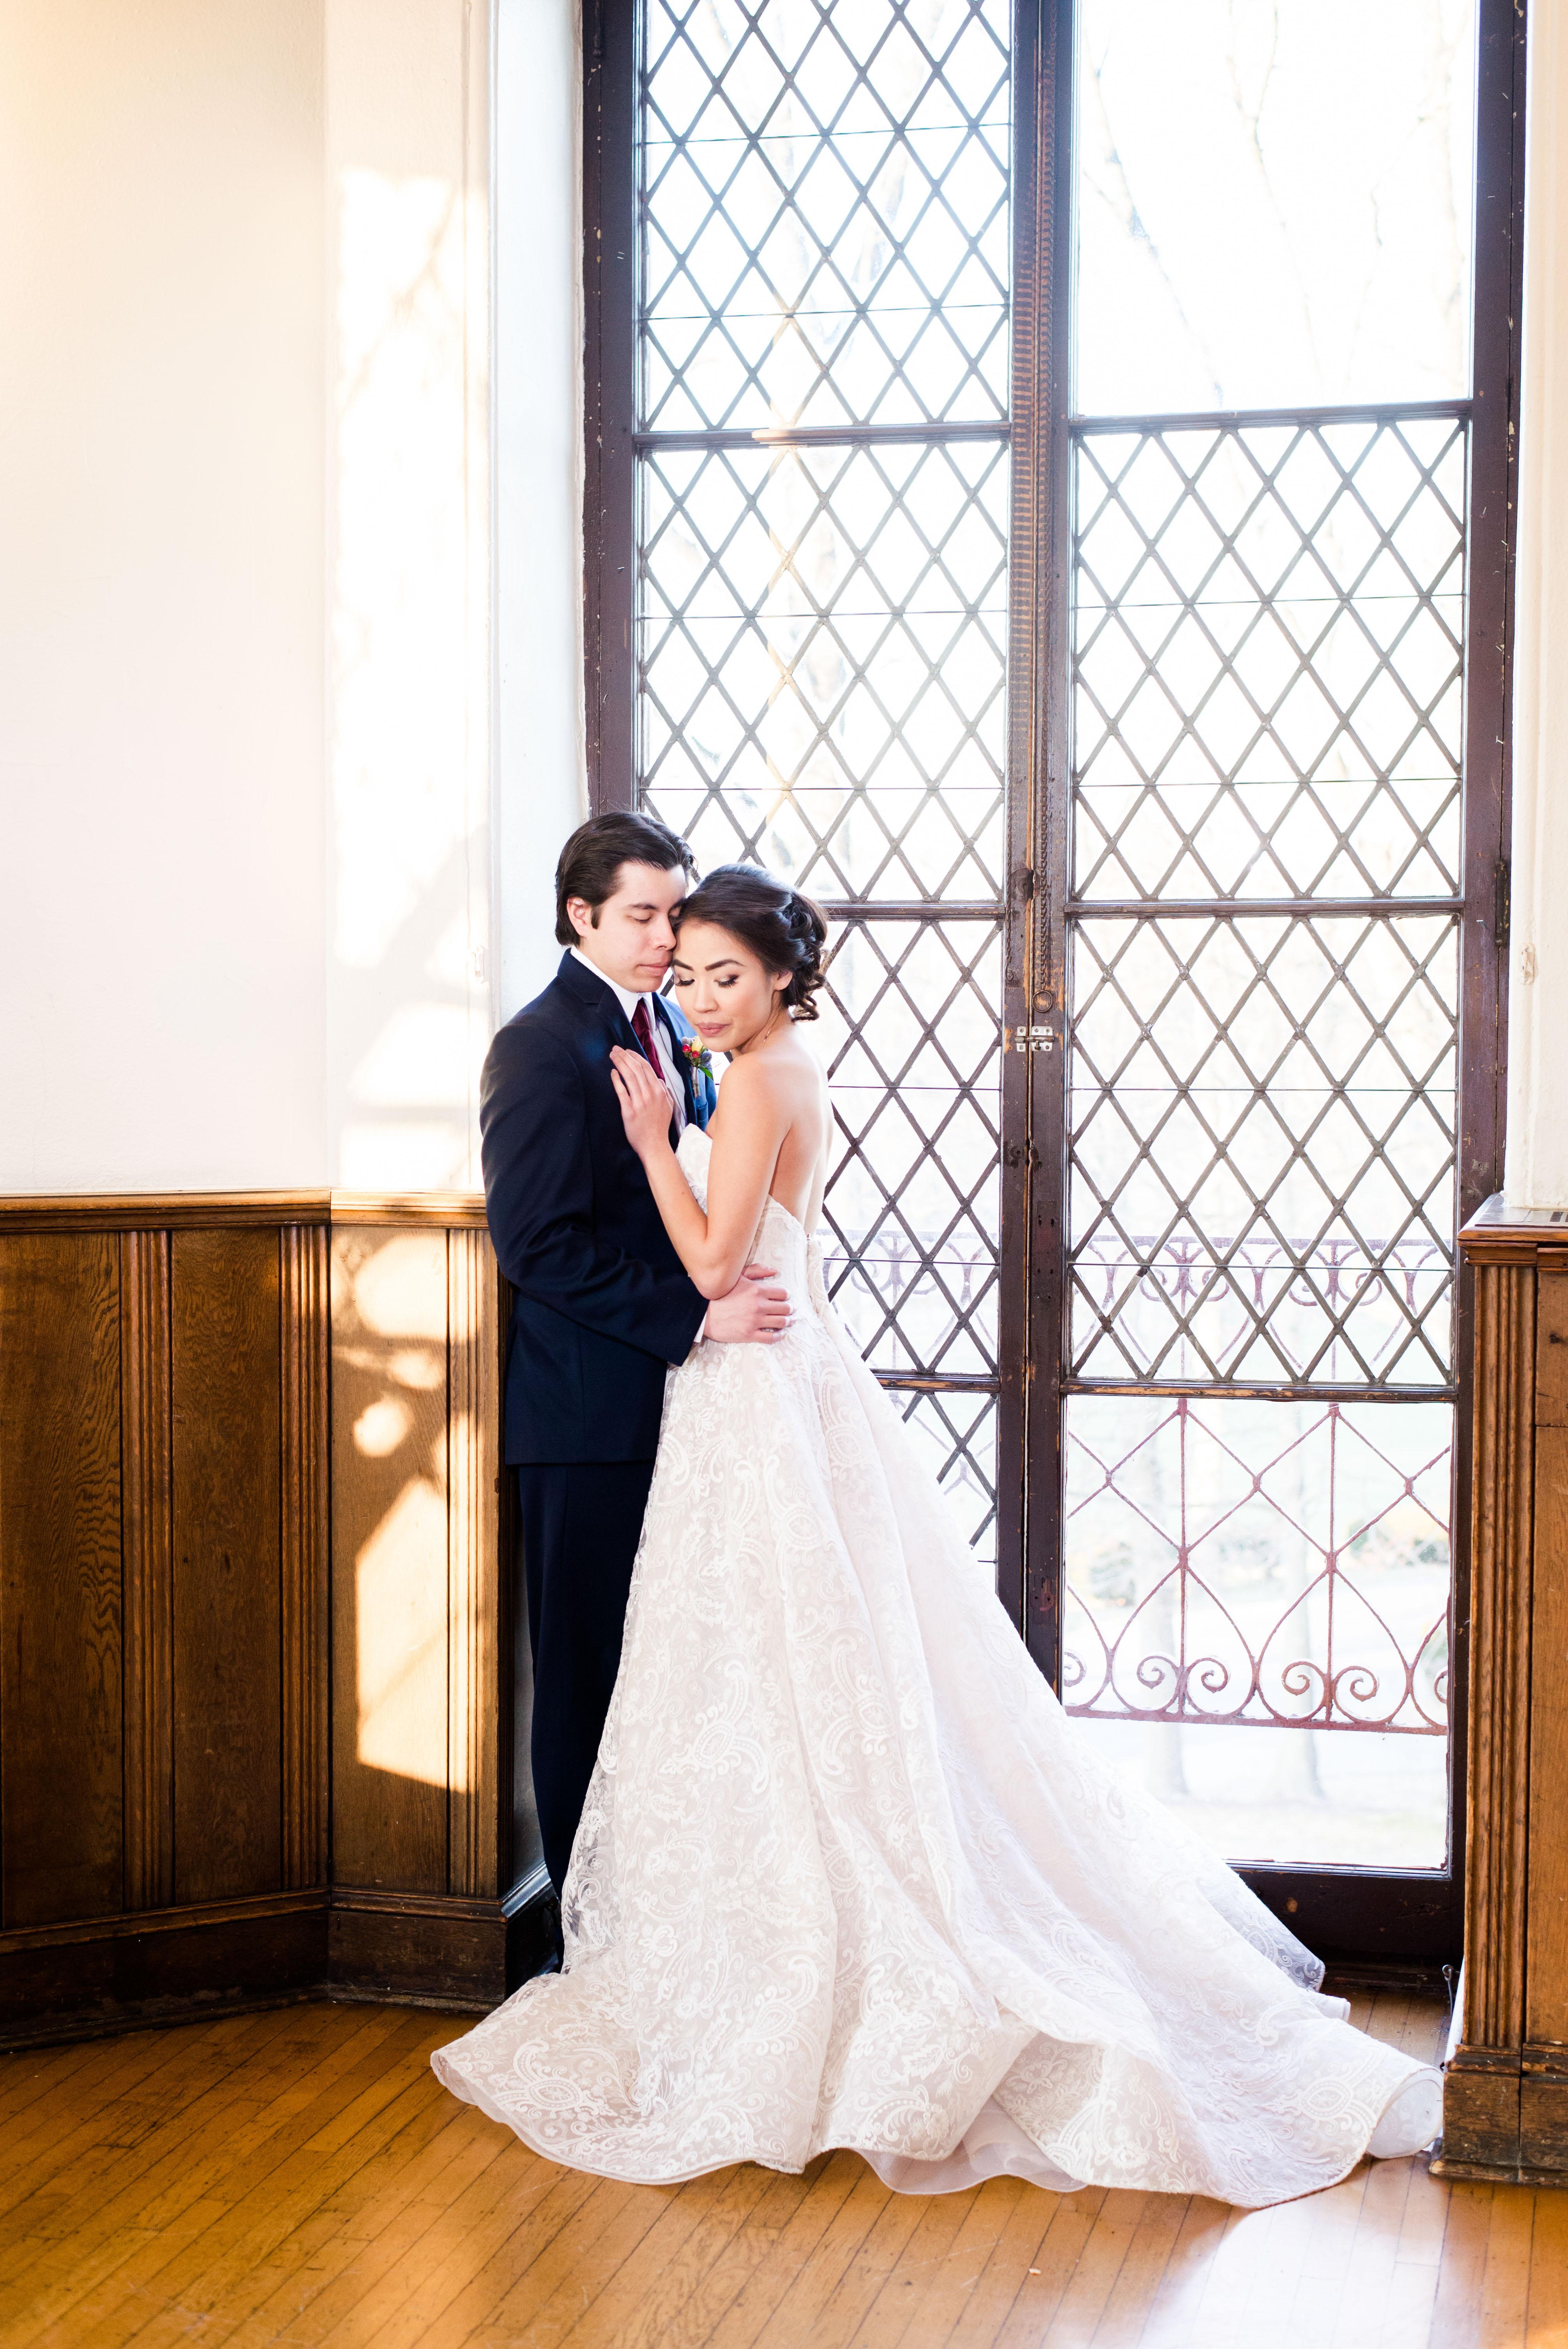 Baldwin-School-Wedding-Photographer-Event-Venue-Pennsylvania-Mainline-Andrea-Krout-Photography-25